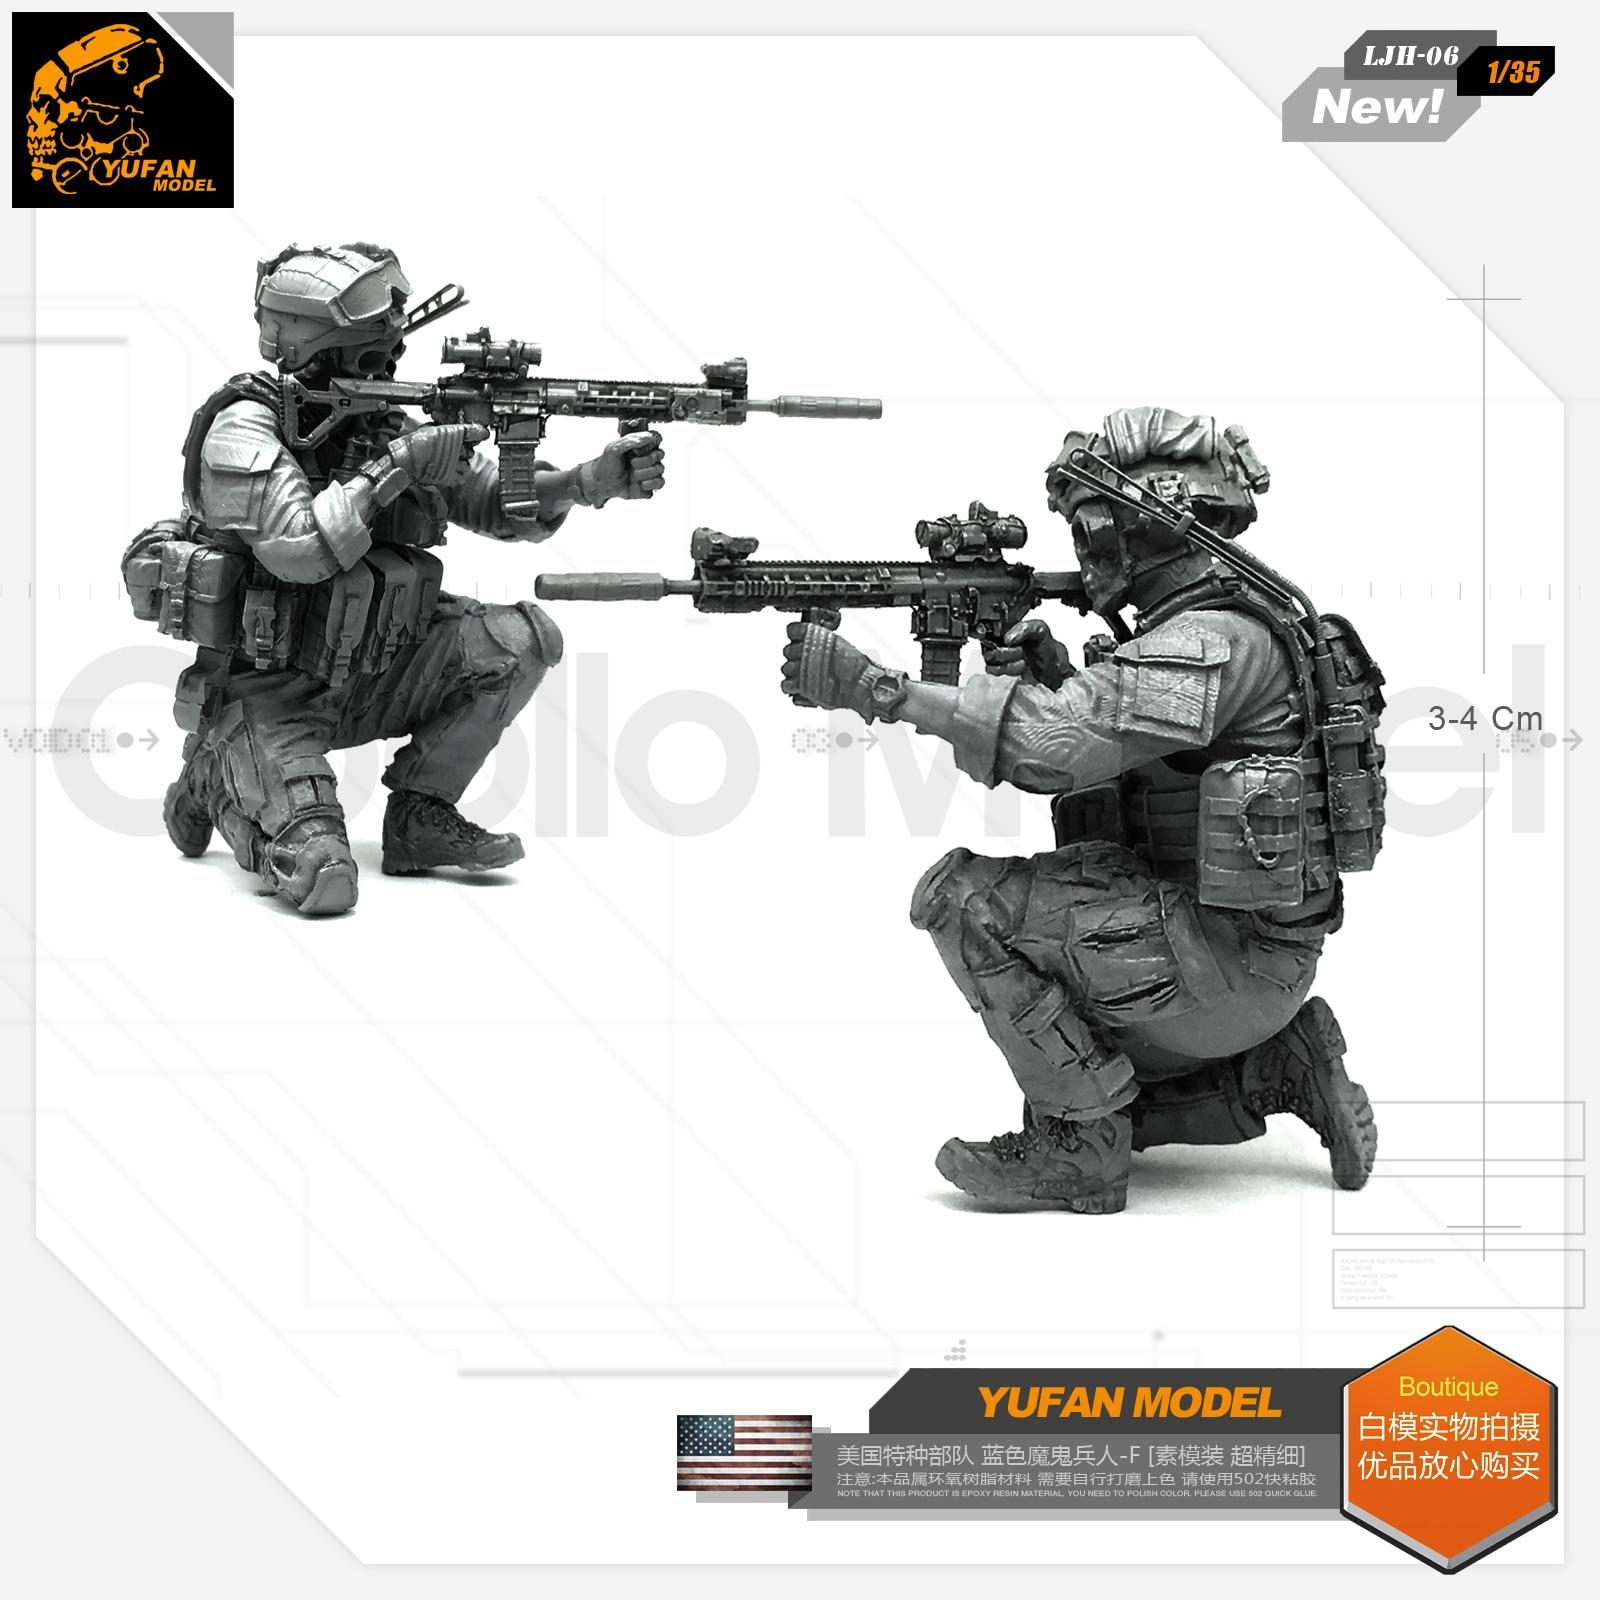 1/35 Fuerzas Especiales estadounidenses diablo azul-F resina modelo LJH-06